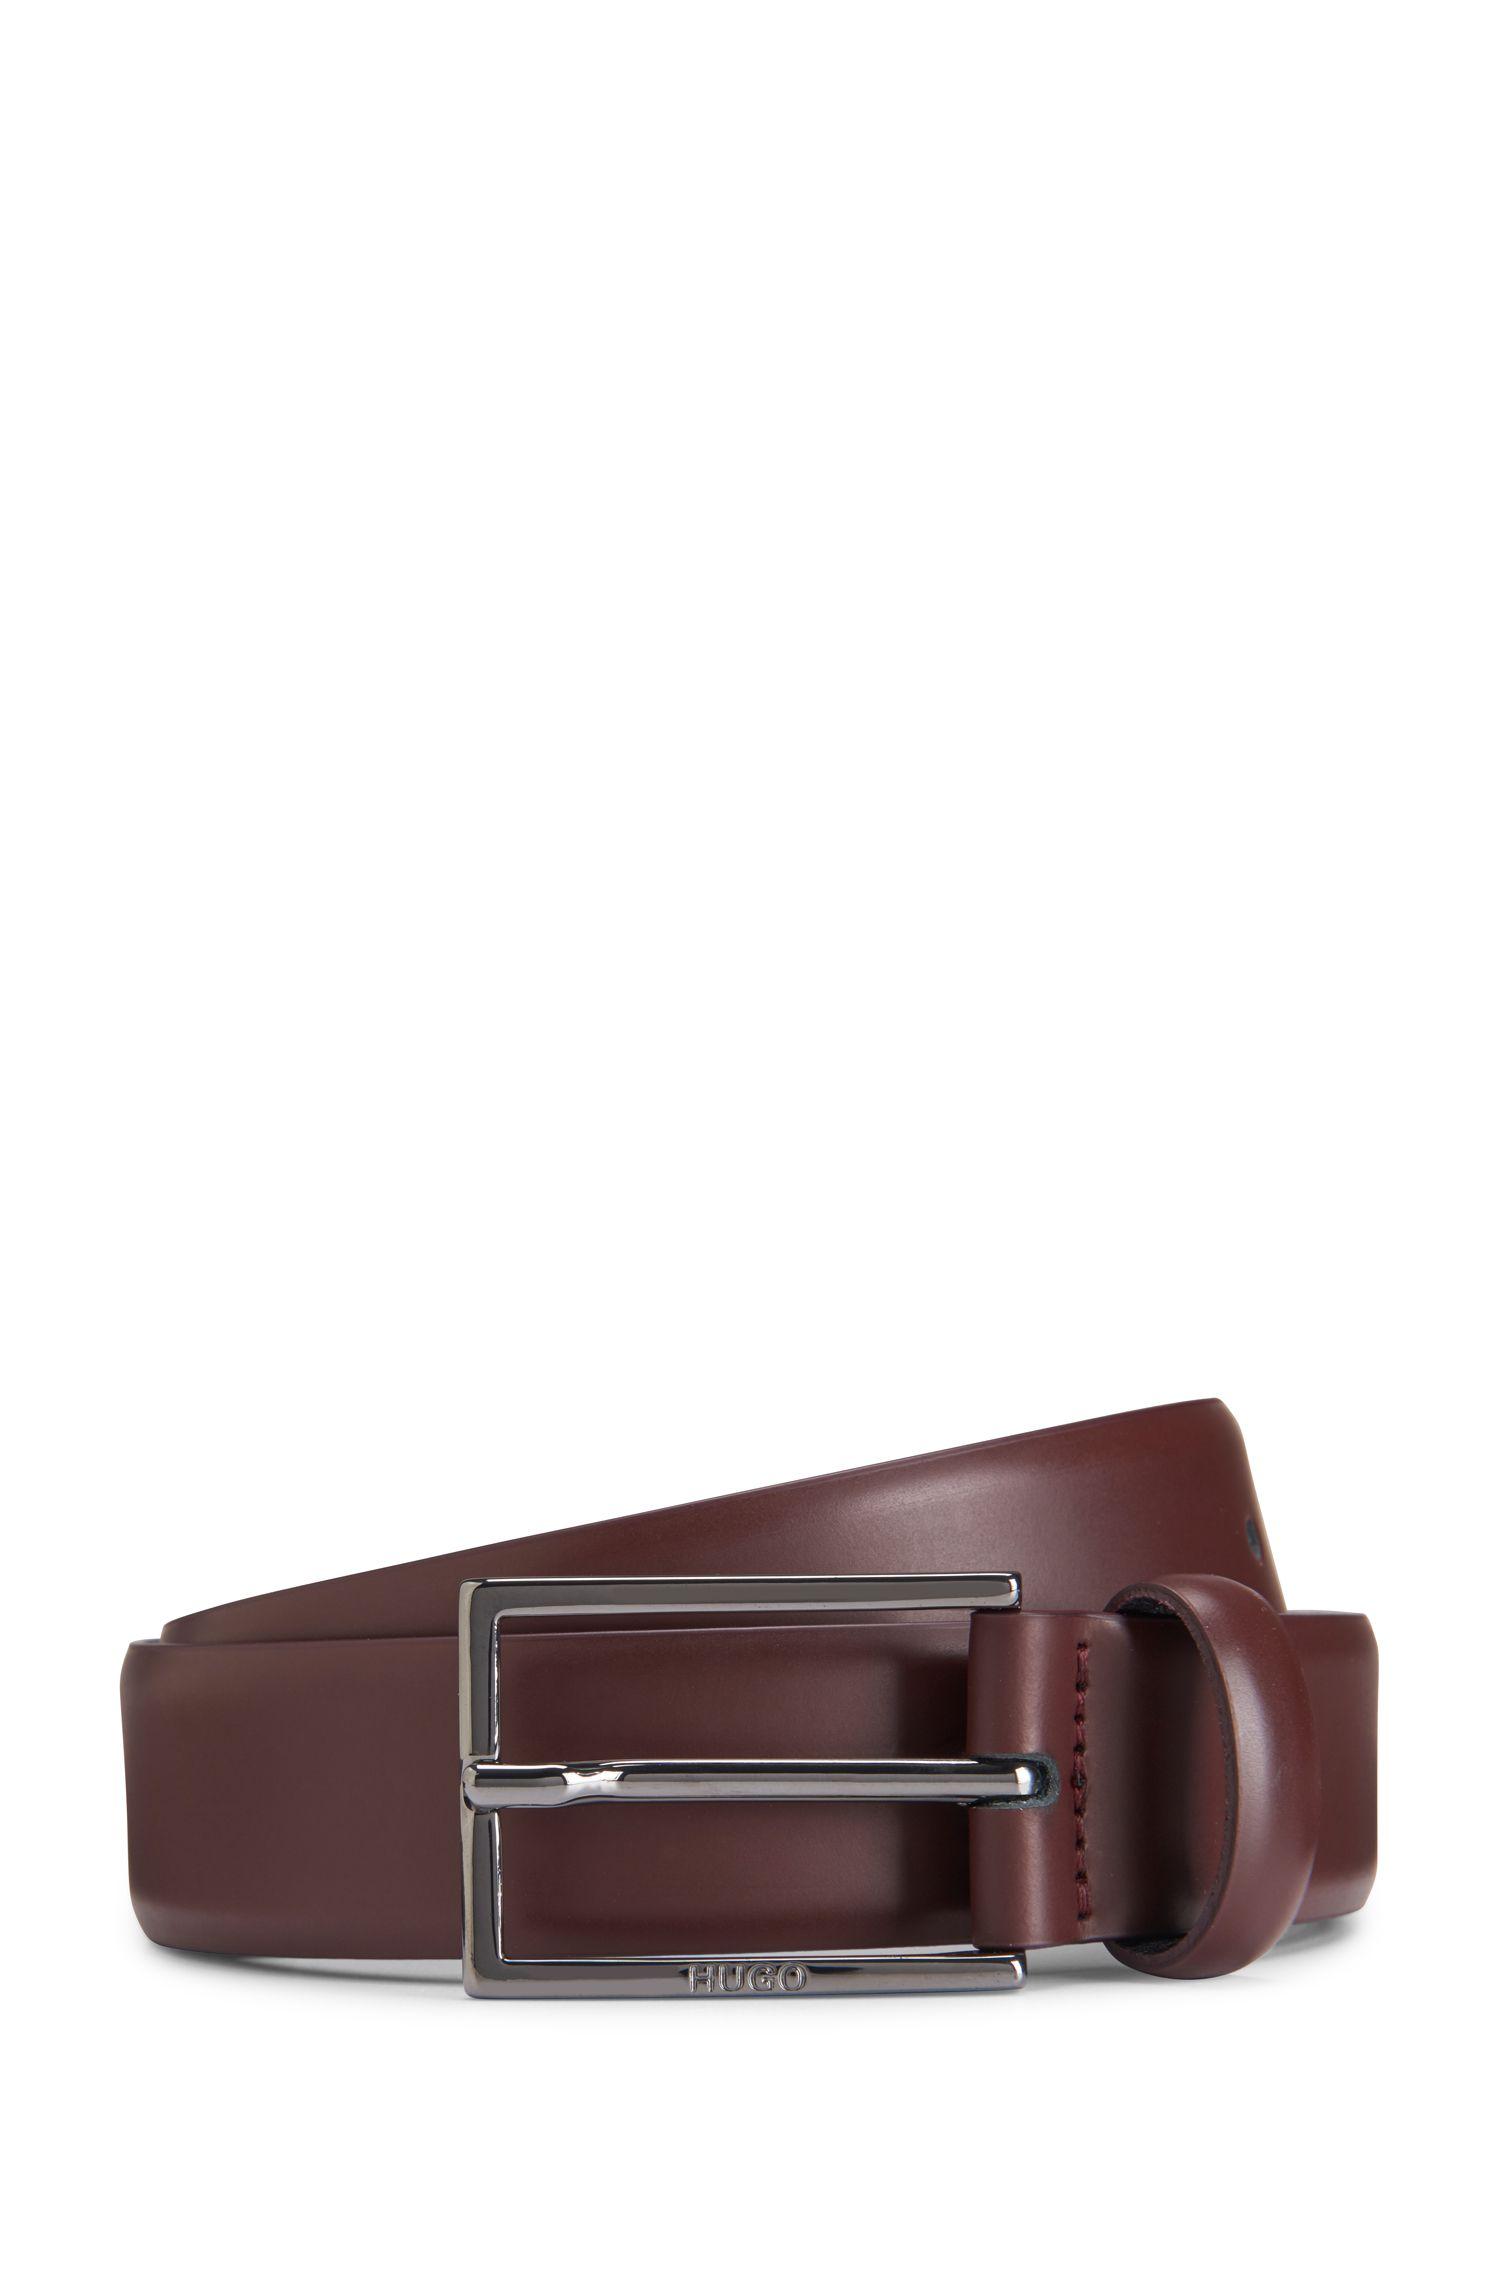 Studded Leather Belt | Gavri Sz30